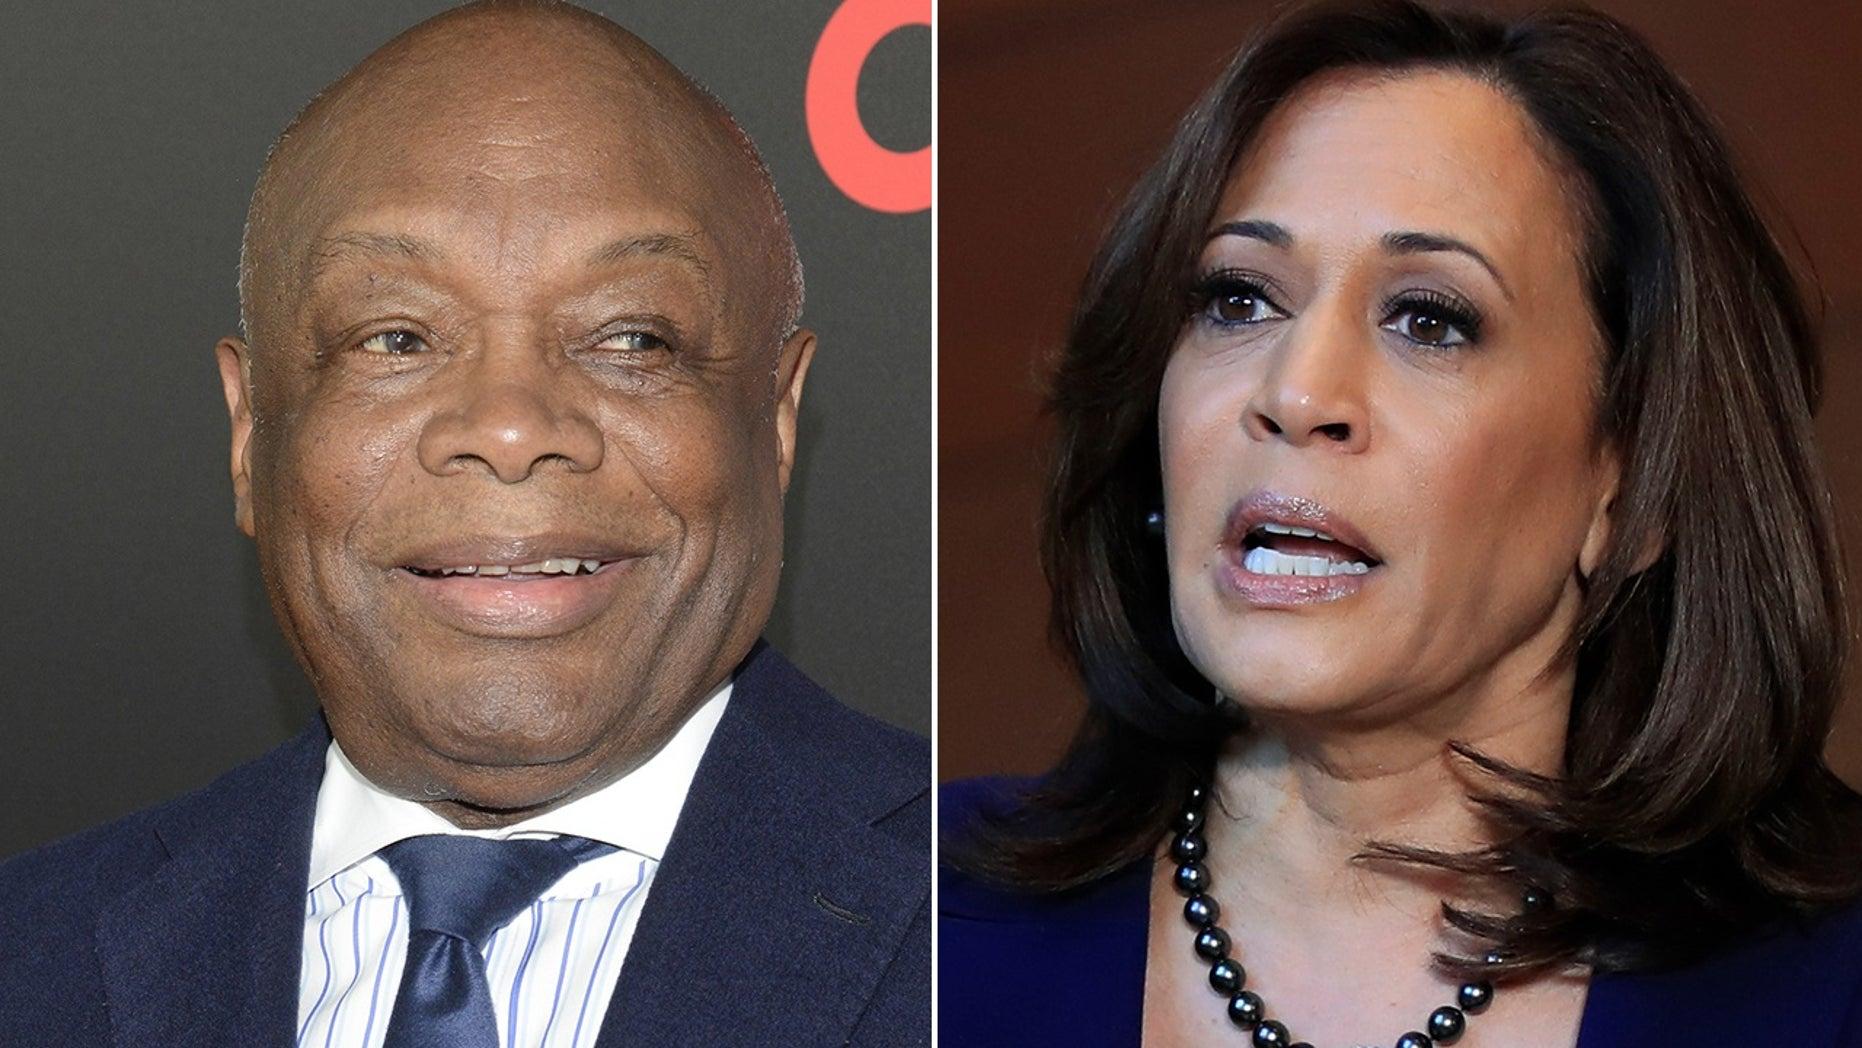 Former San Francisco Mayor Willie Brown and US Senator Kamala Harris